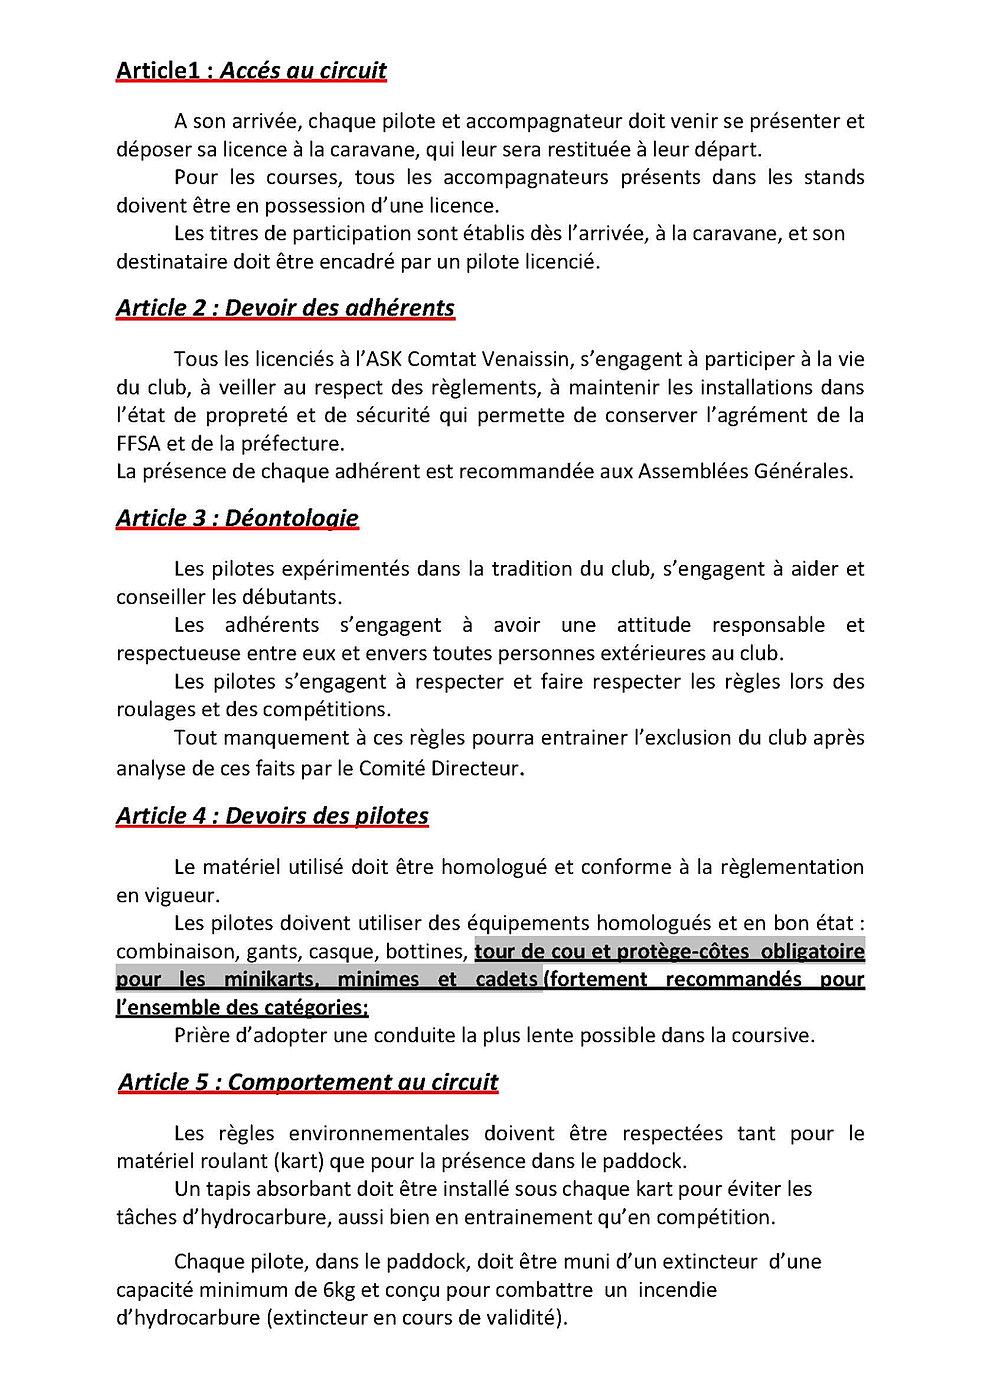 Karting carpentras r glement int rieur for Reglement interieur association sportive